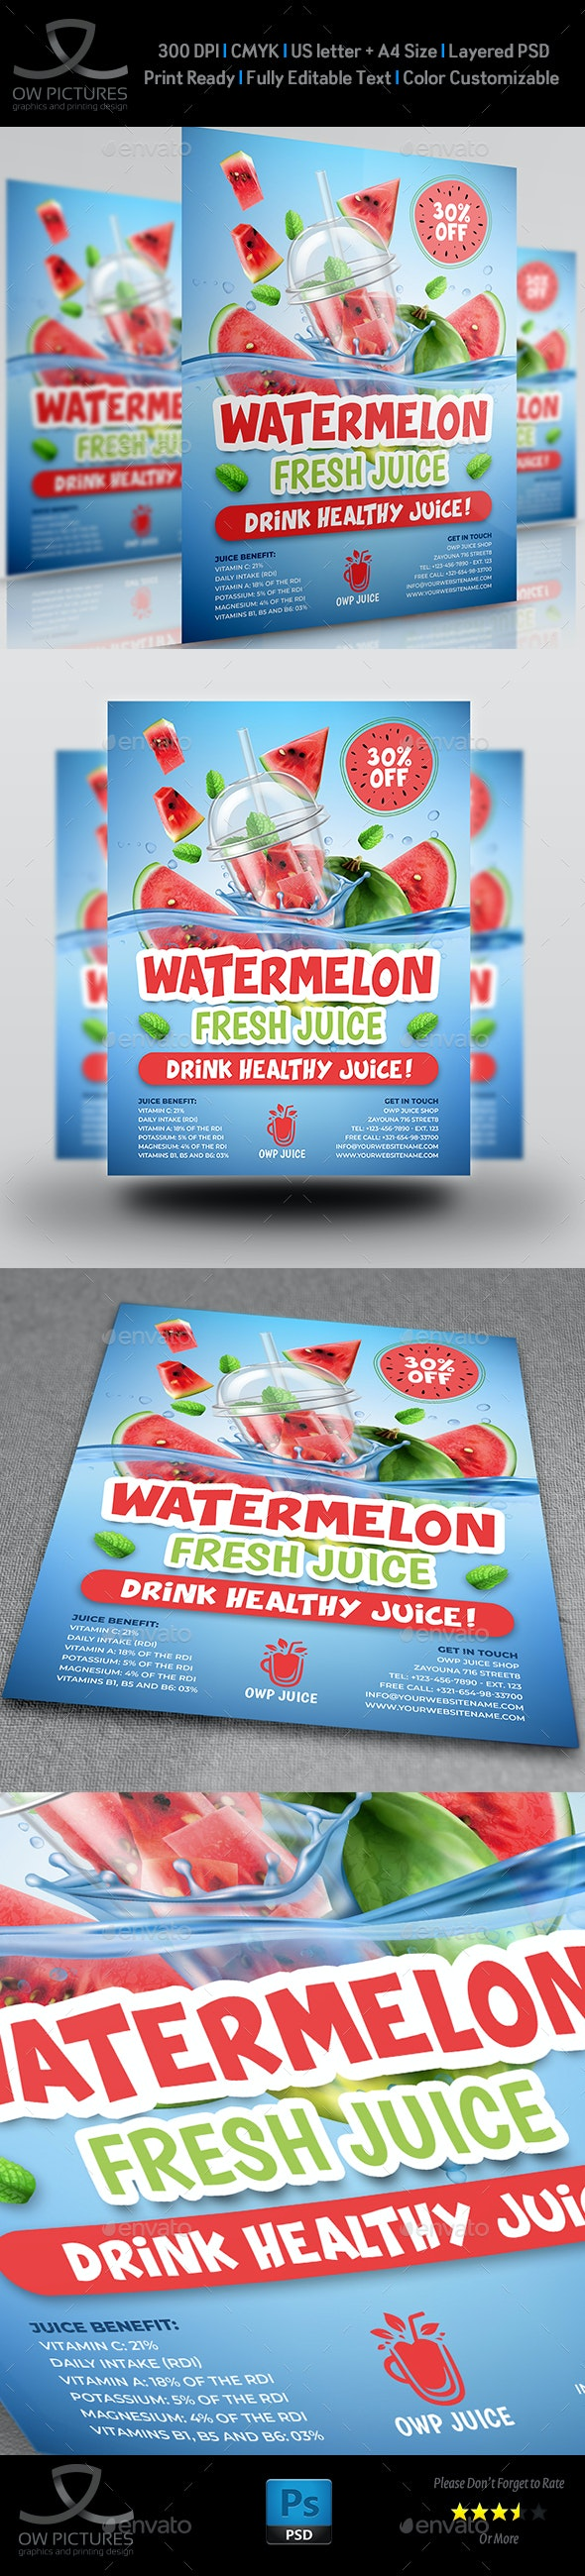 Watermelon Juice Flyer Template - Flyers Print Templates